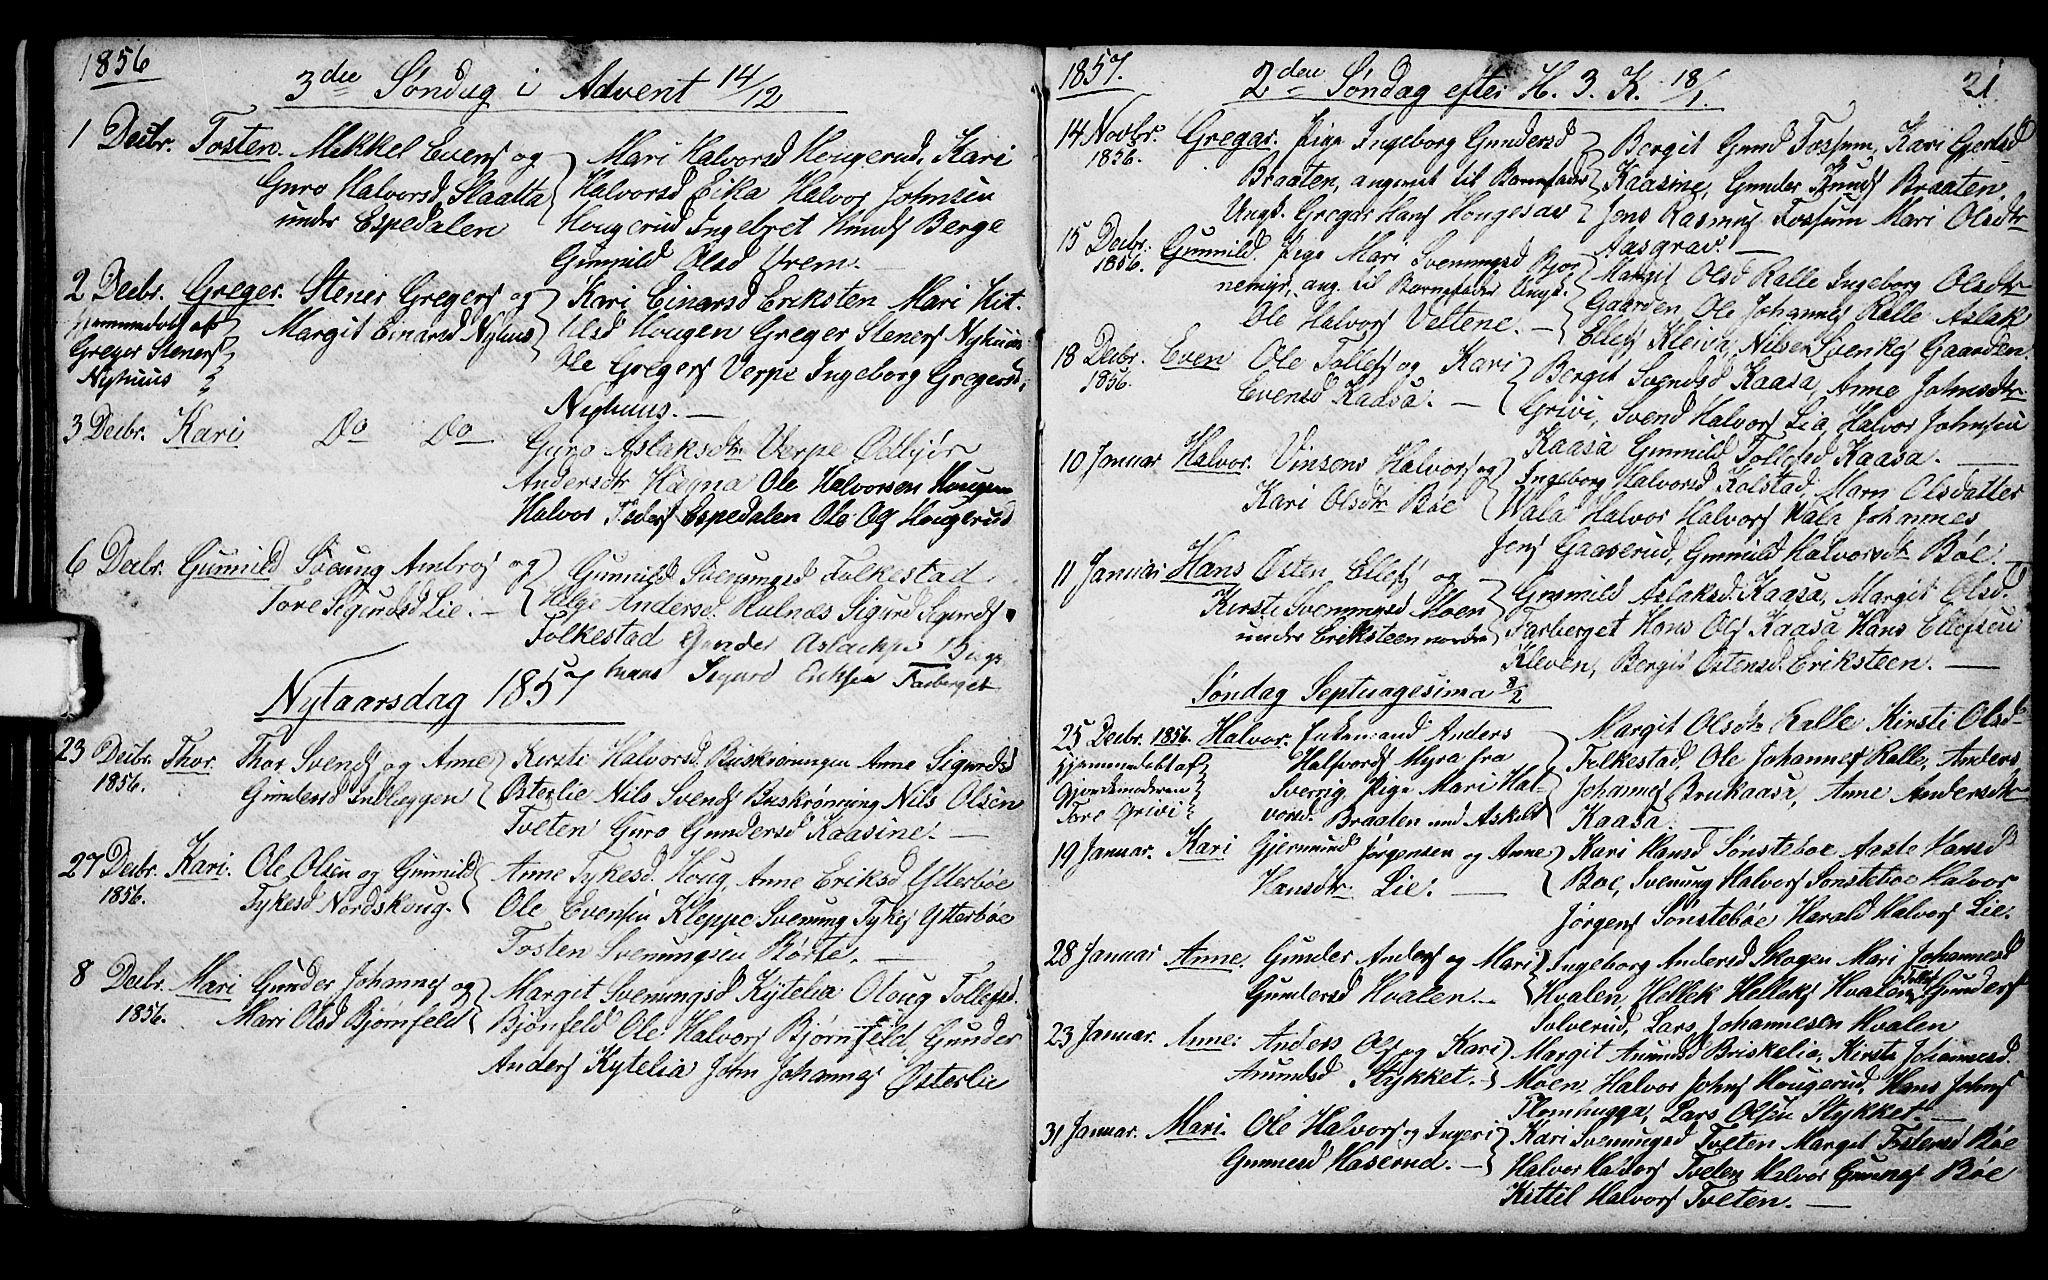 SAKO, Bø kirkebøker, G/Ga/L0002: Klokkerbok nr. 2, 1853-1866, s. 21